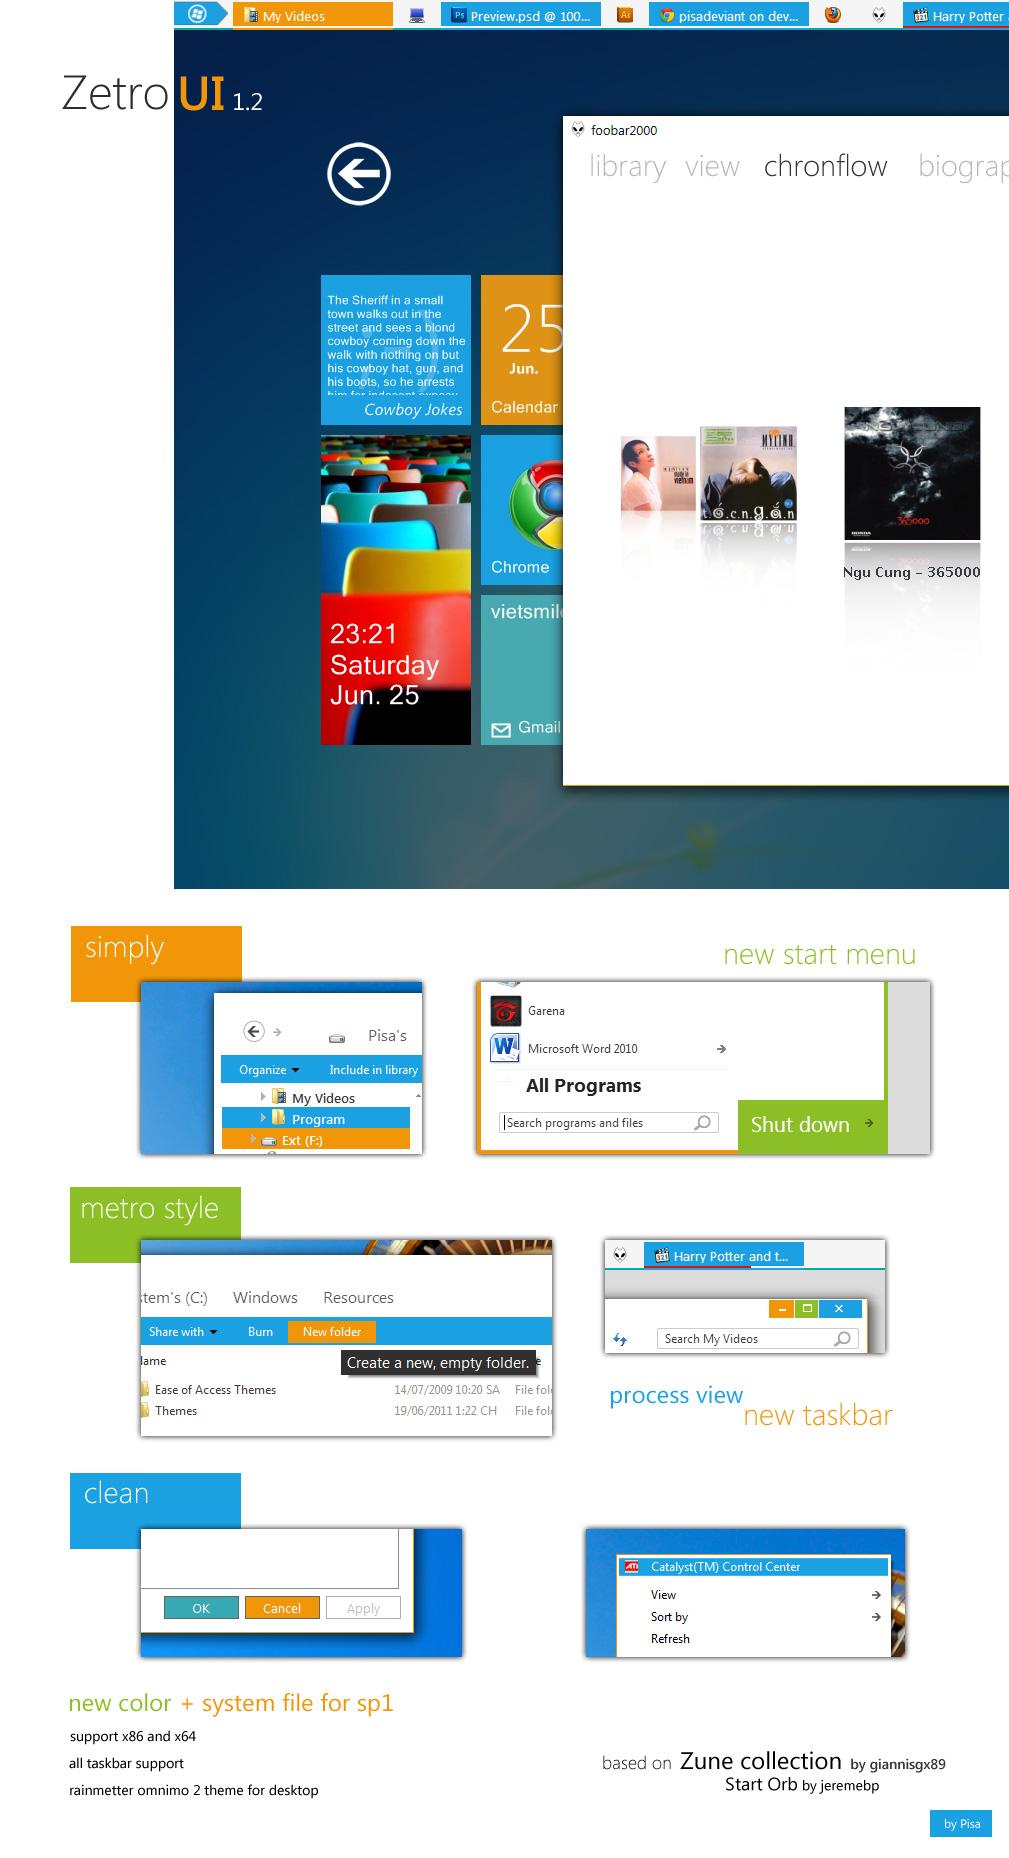 Zetro VS 1.2 — Windows 8 Metro 风格 Windows 7 主题 - 第1张  | 大博辞